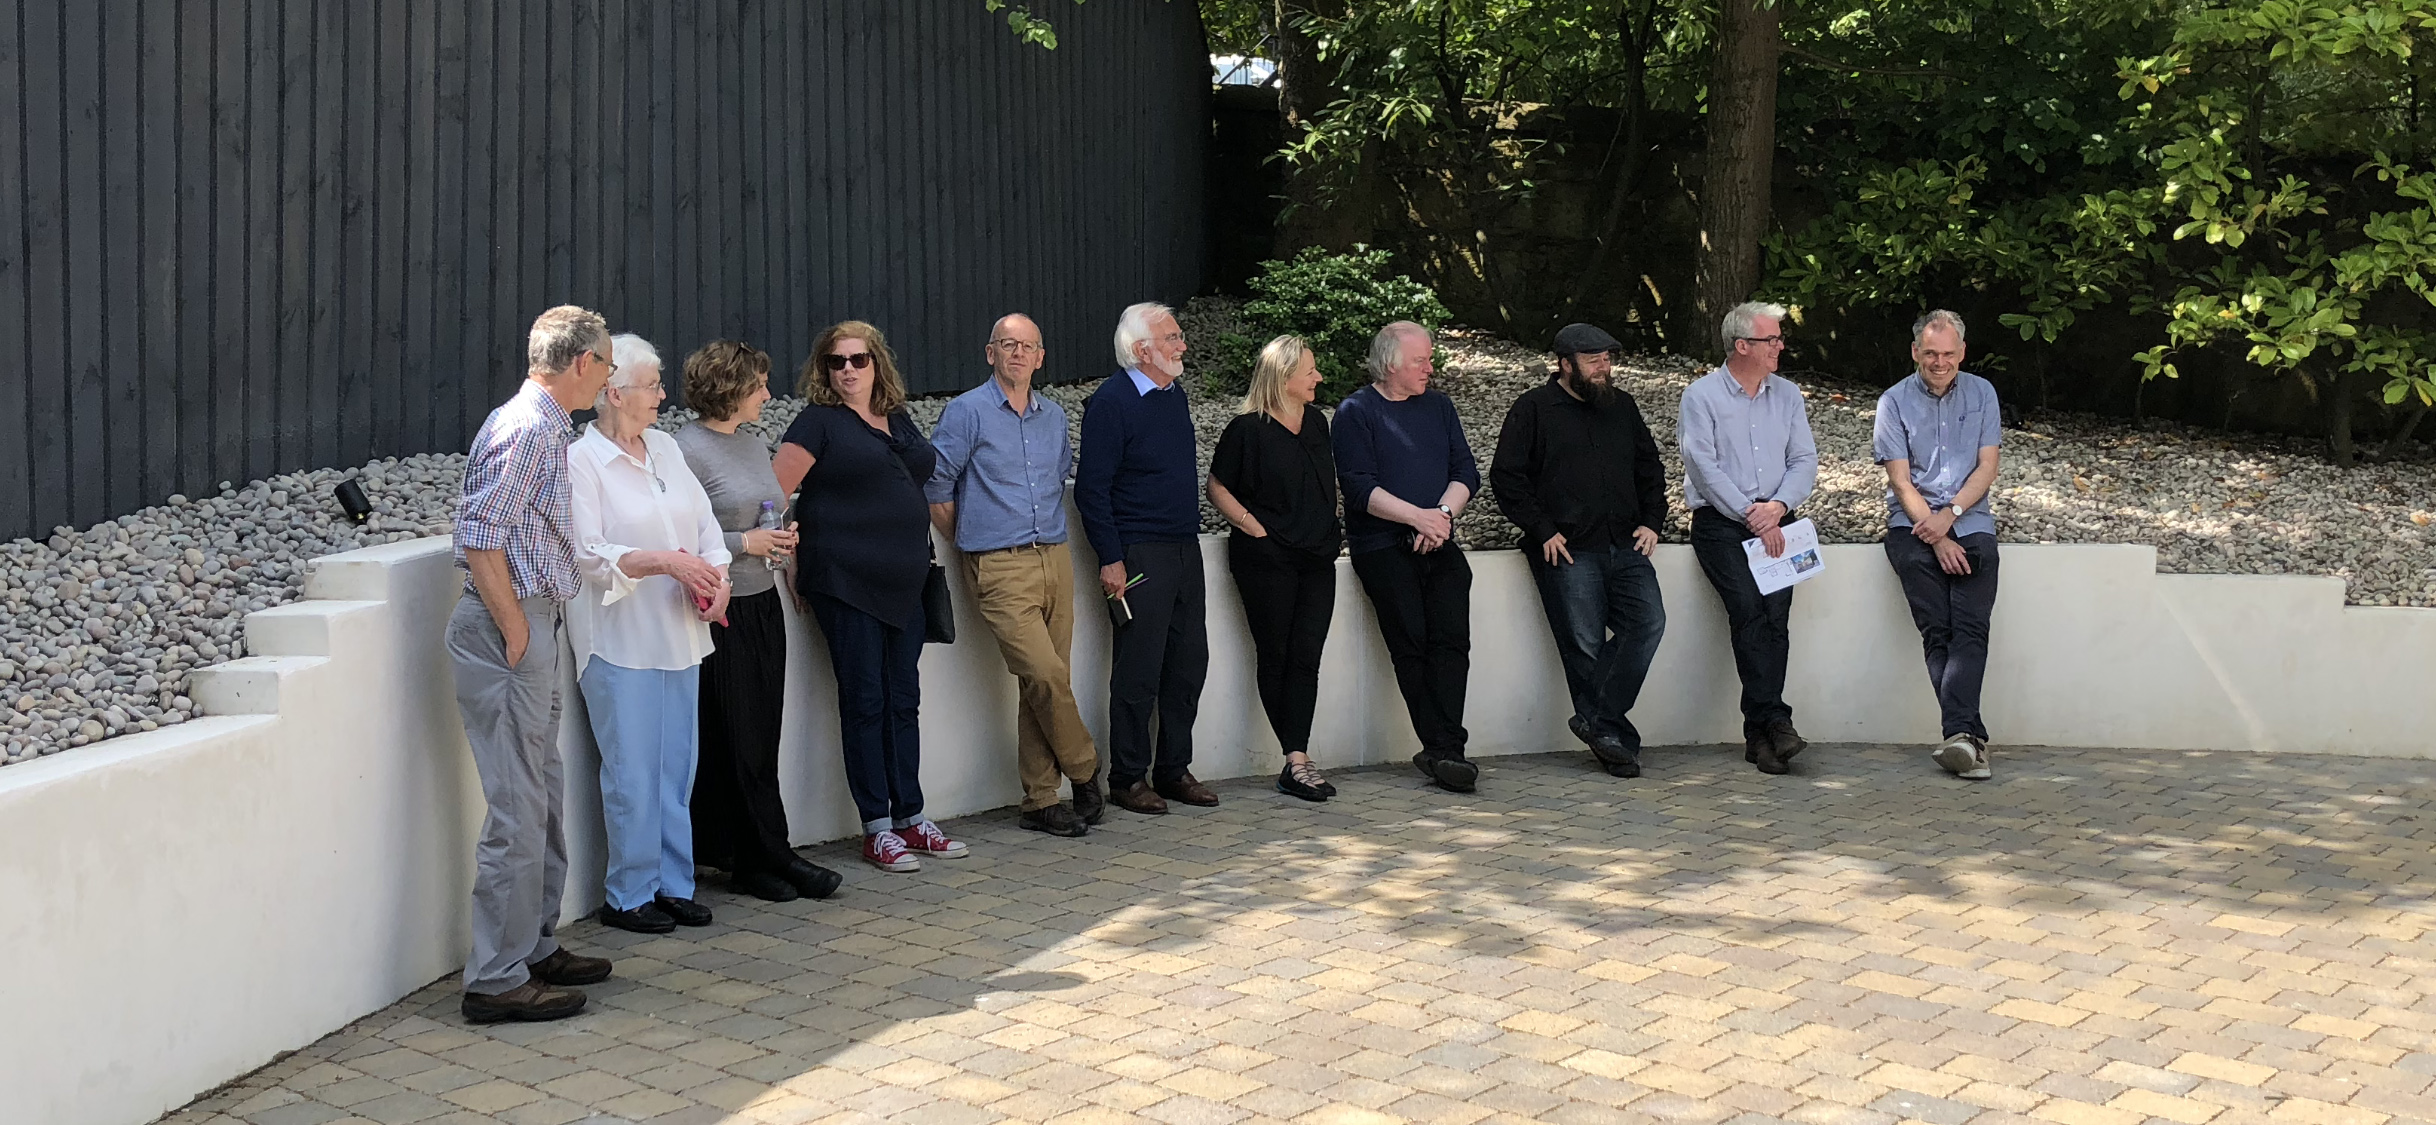 Saltire Awards Judges visit The Coach House!